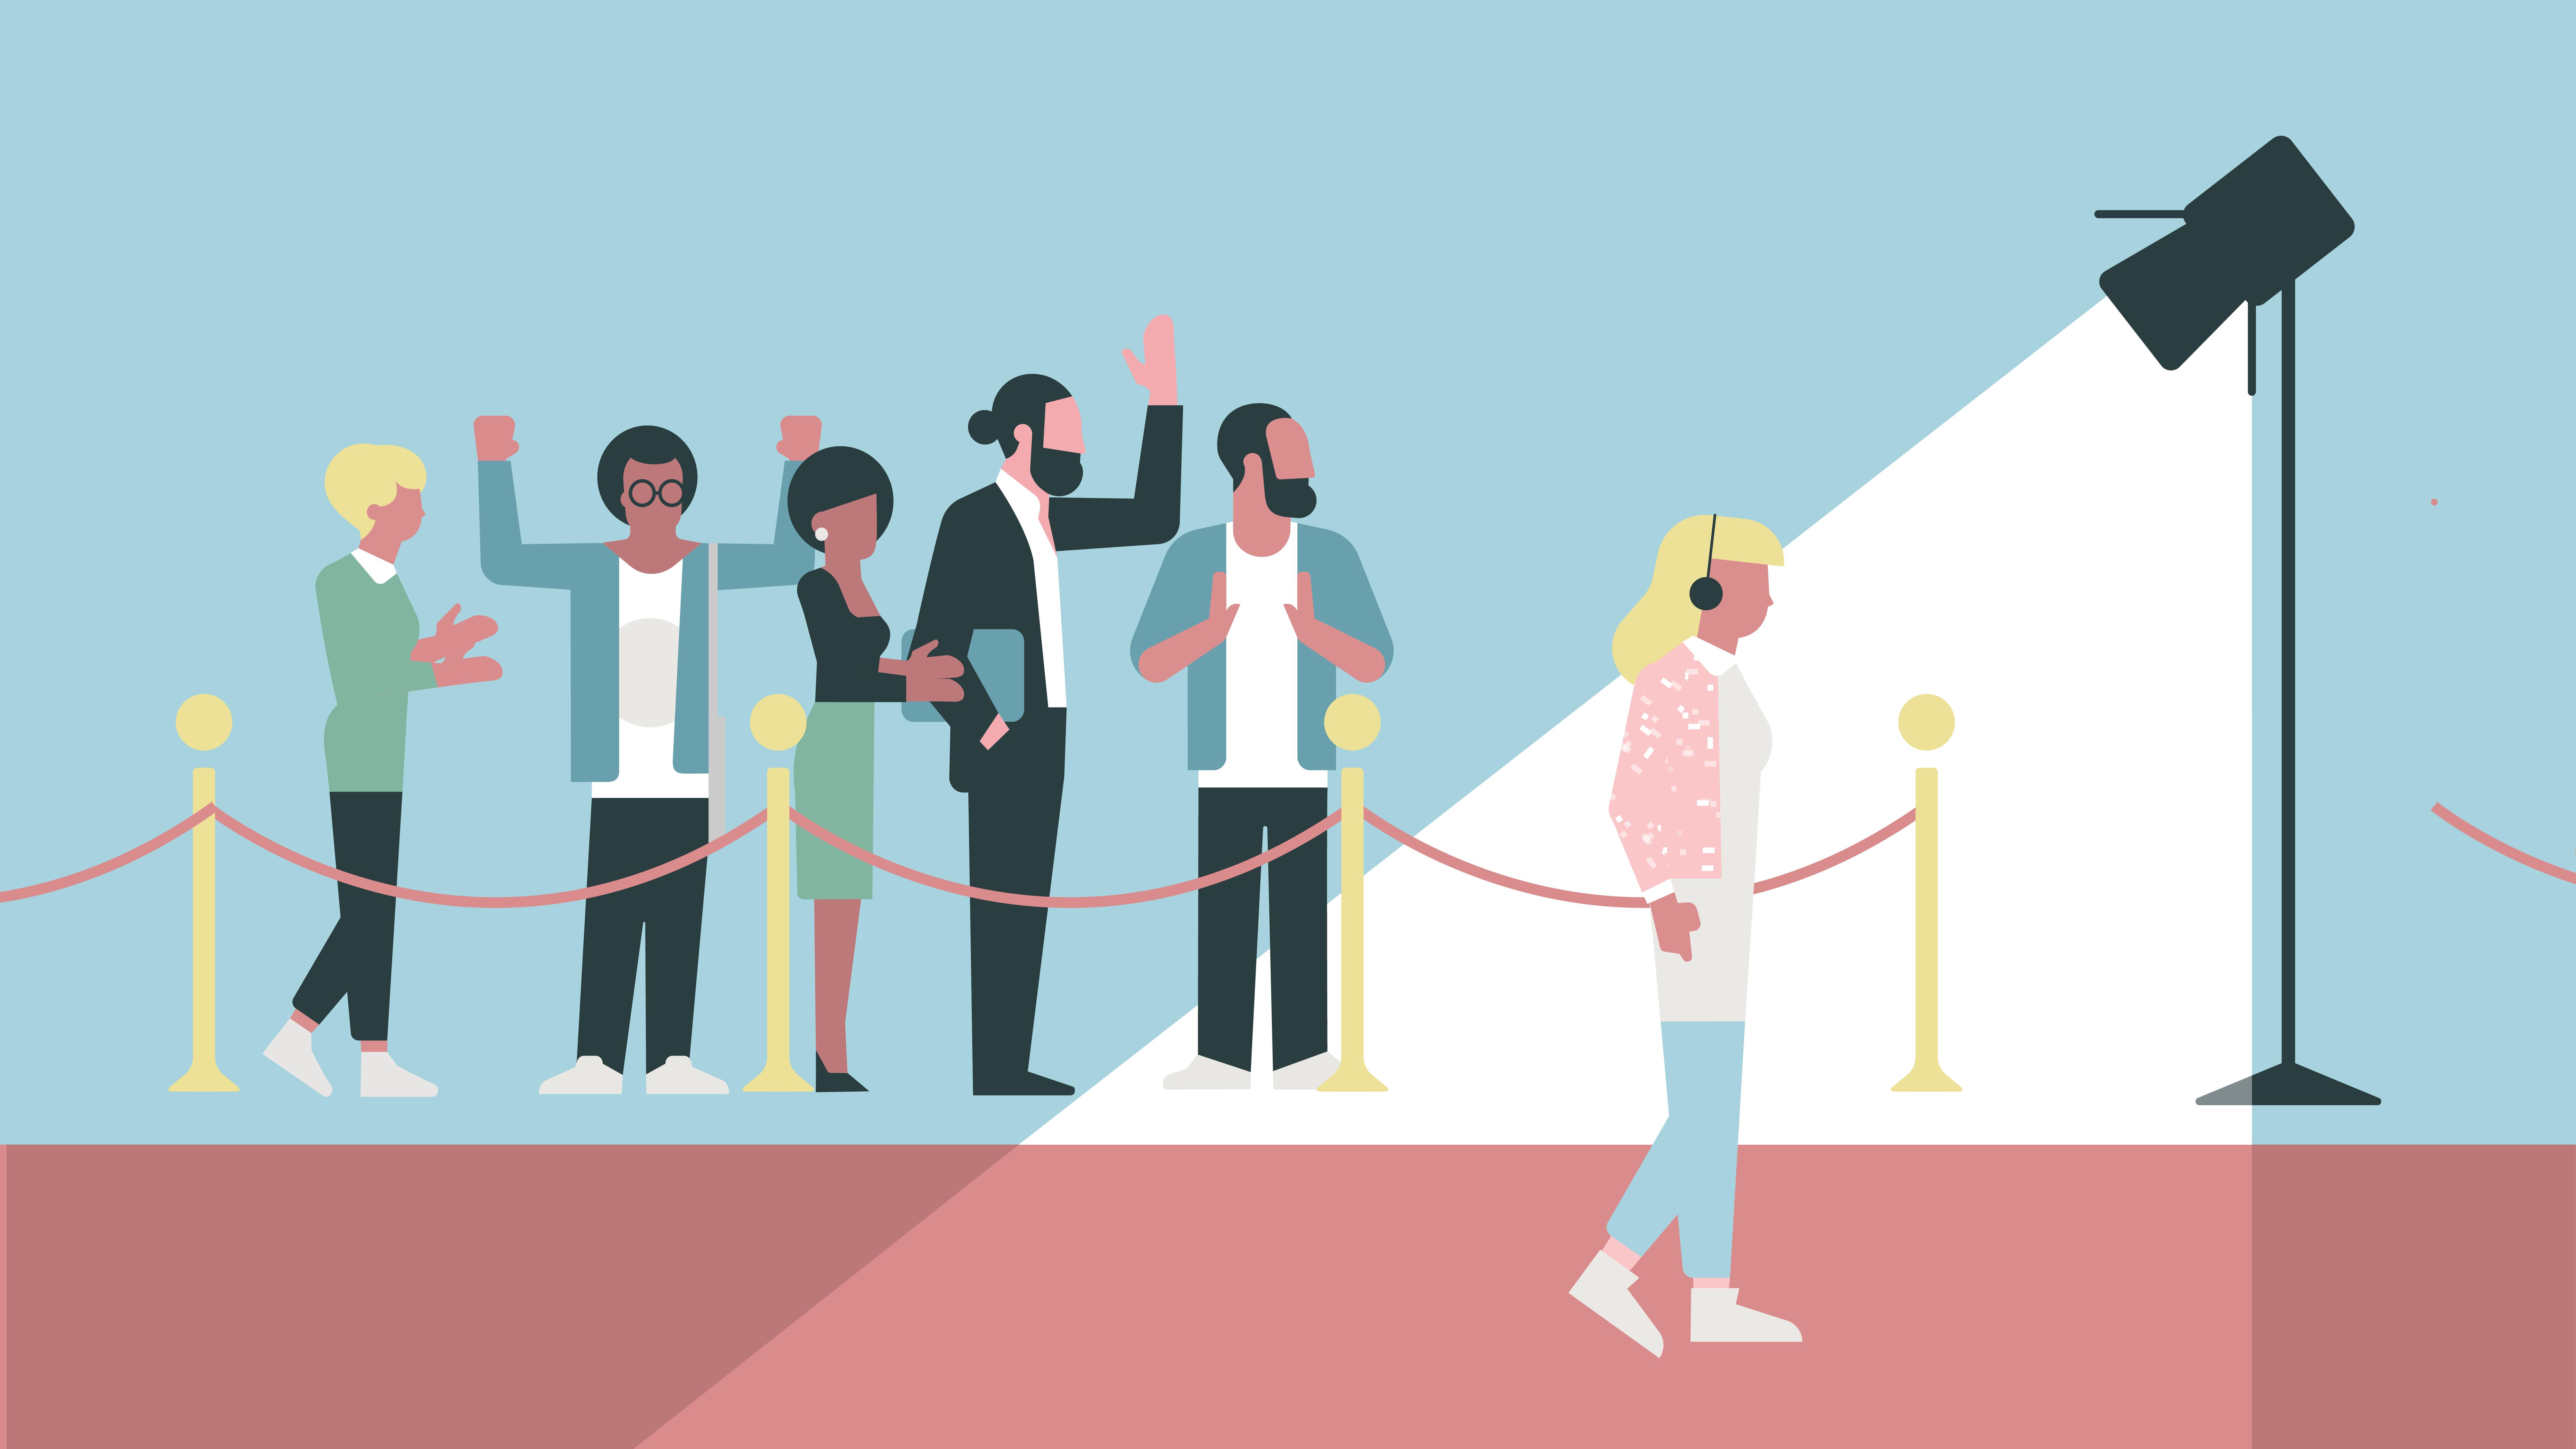 Customer Service 2020: Four Steps to Modernize Service Experiences